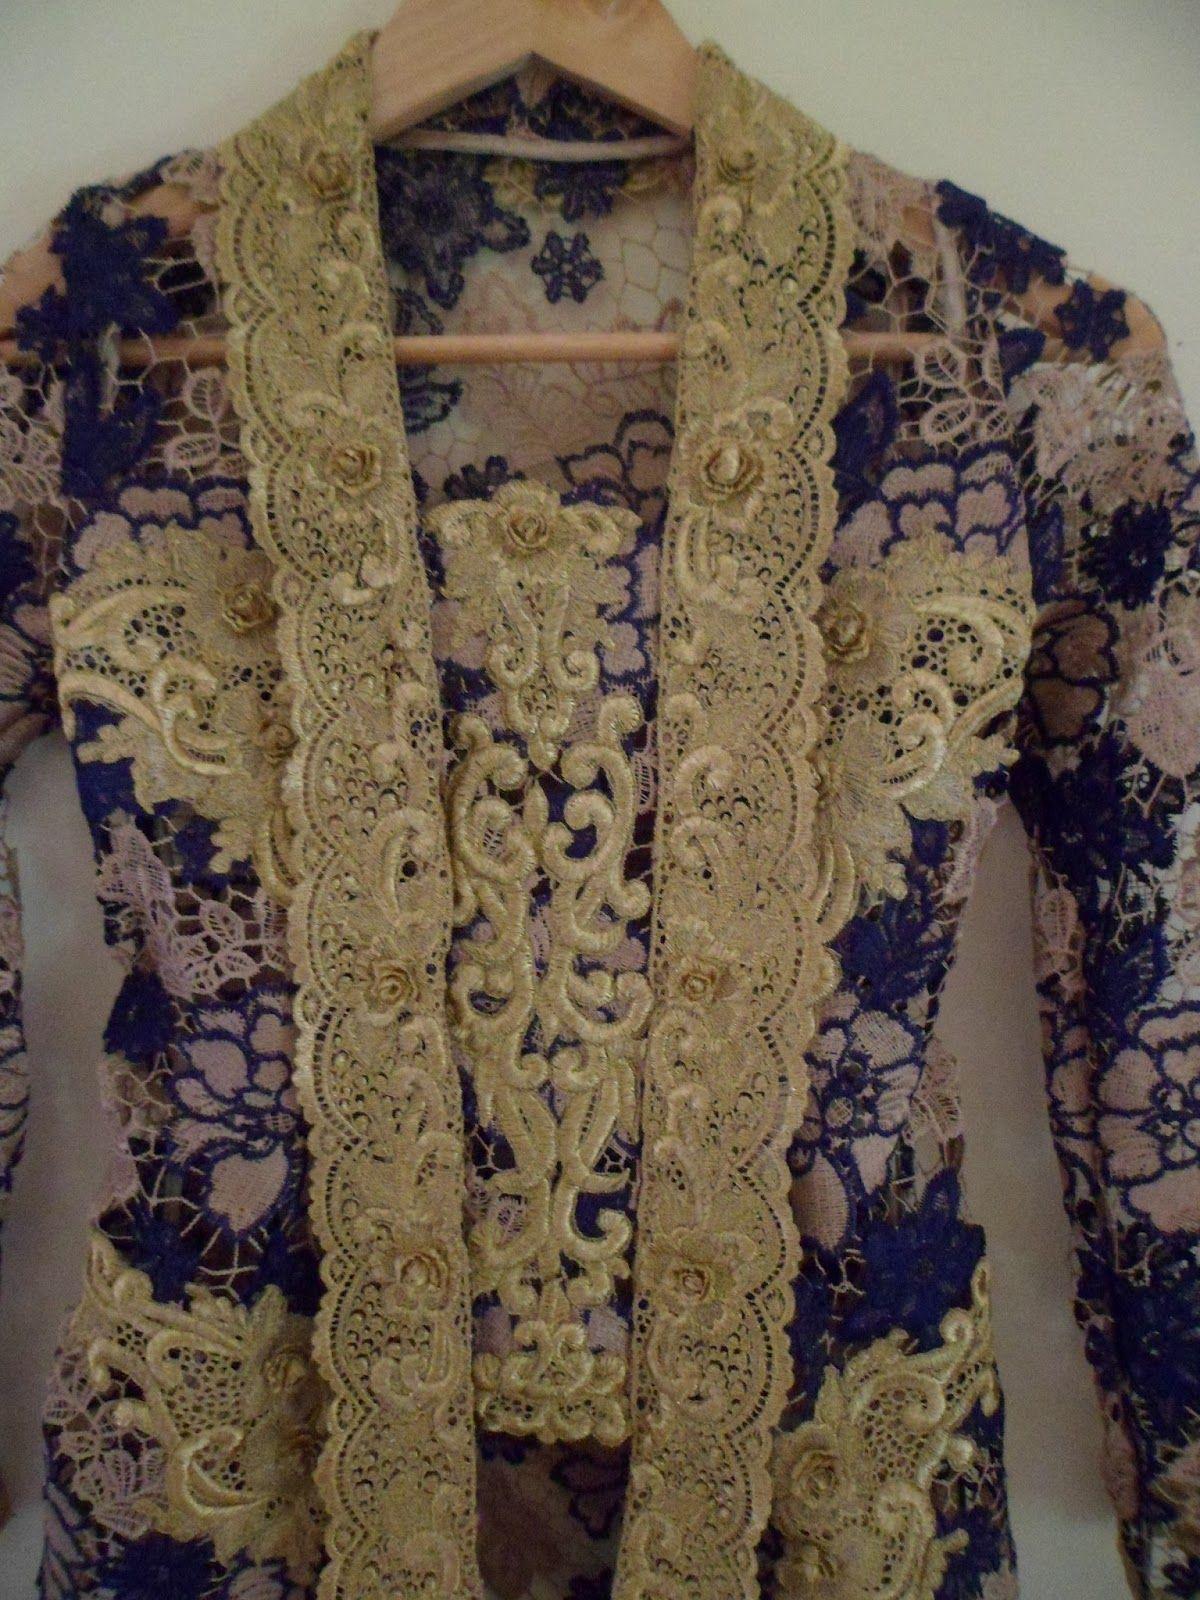 Pin by pinky kumeli on Fashion Inspiration Kebaya Baju Kurung Batik Songket Ikat SarongTenun Pinterest